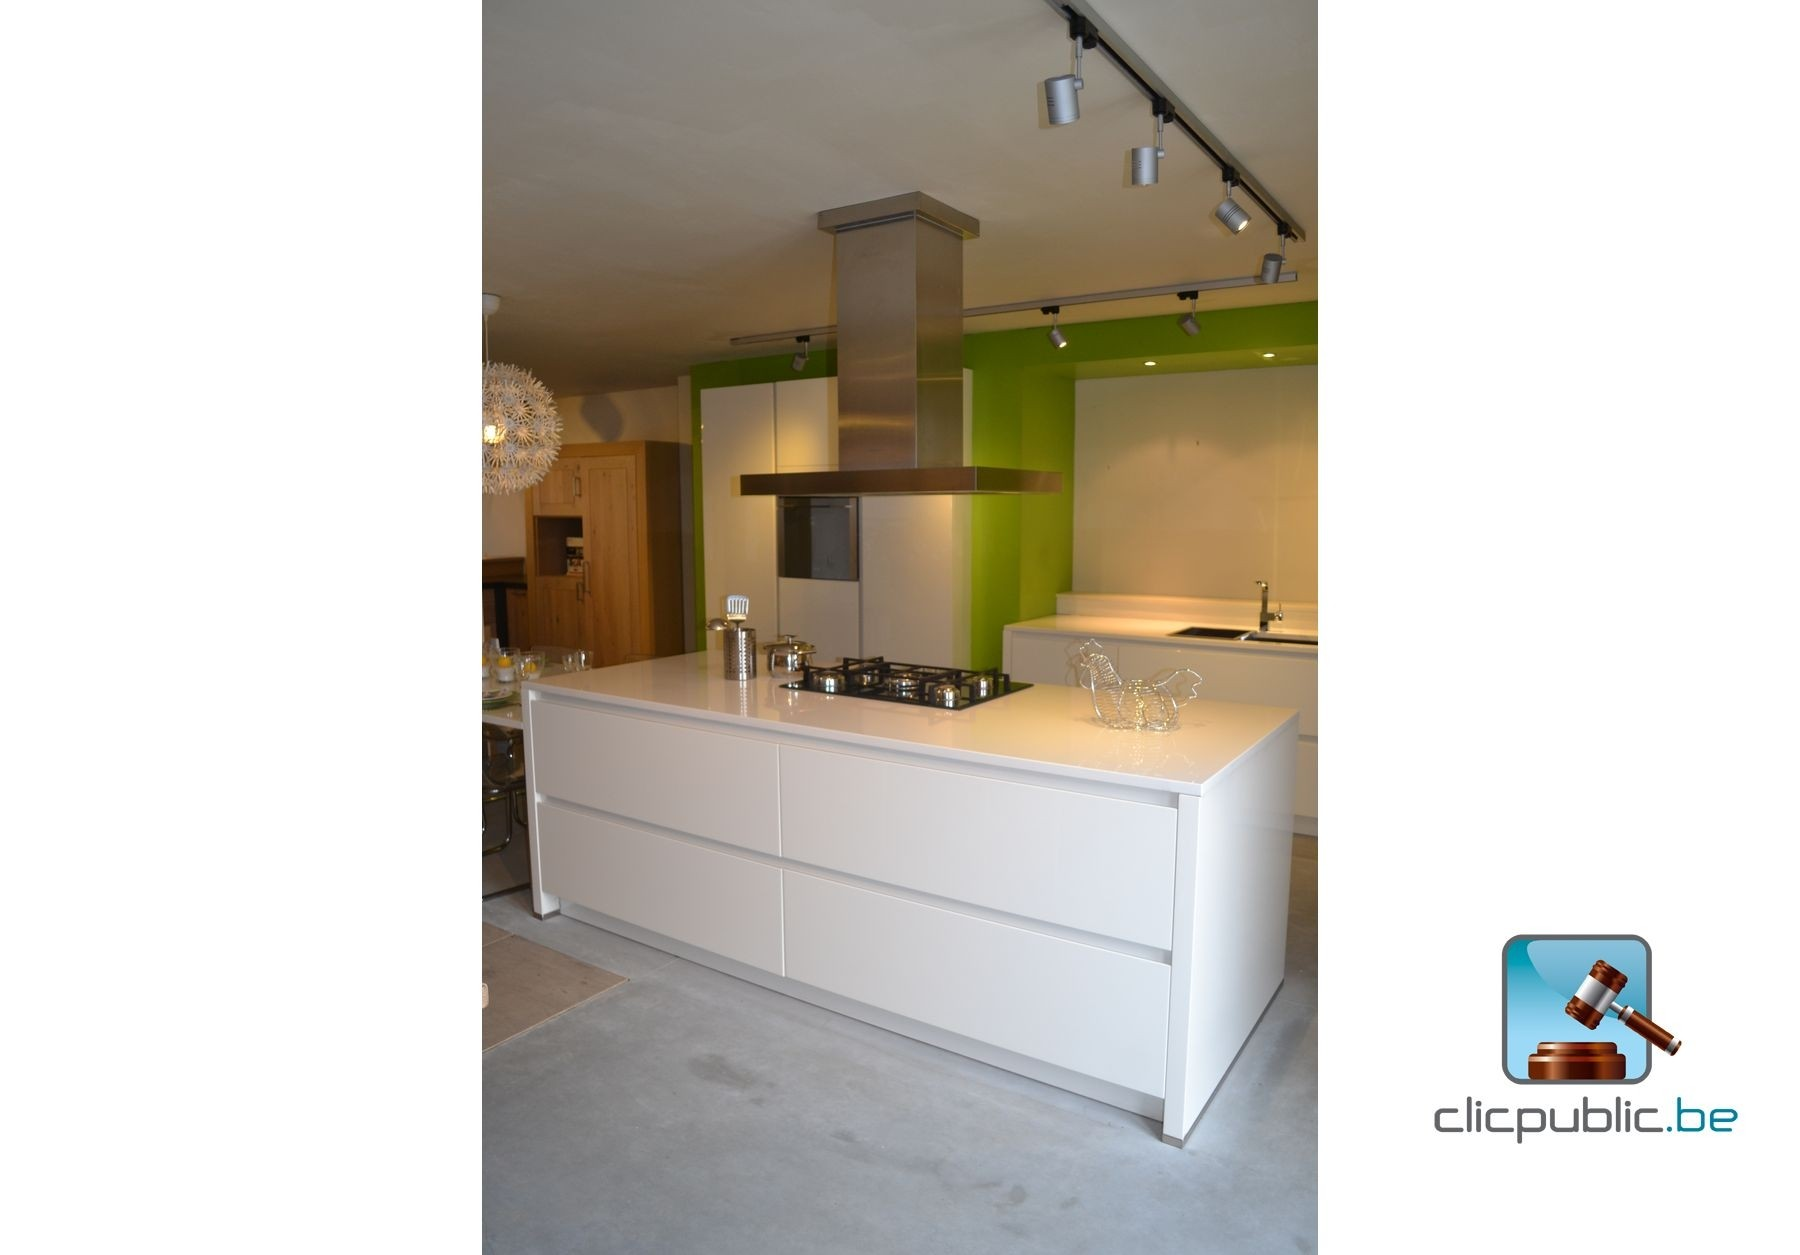 Keuken ref 5 te koop op - Model keuken wit gelakt ...